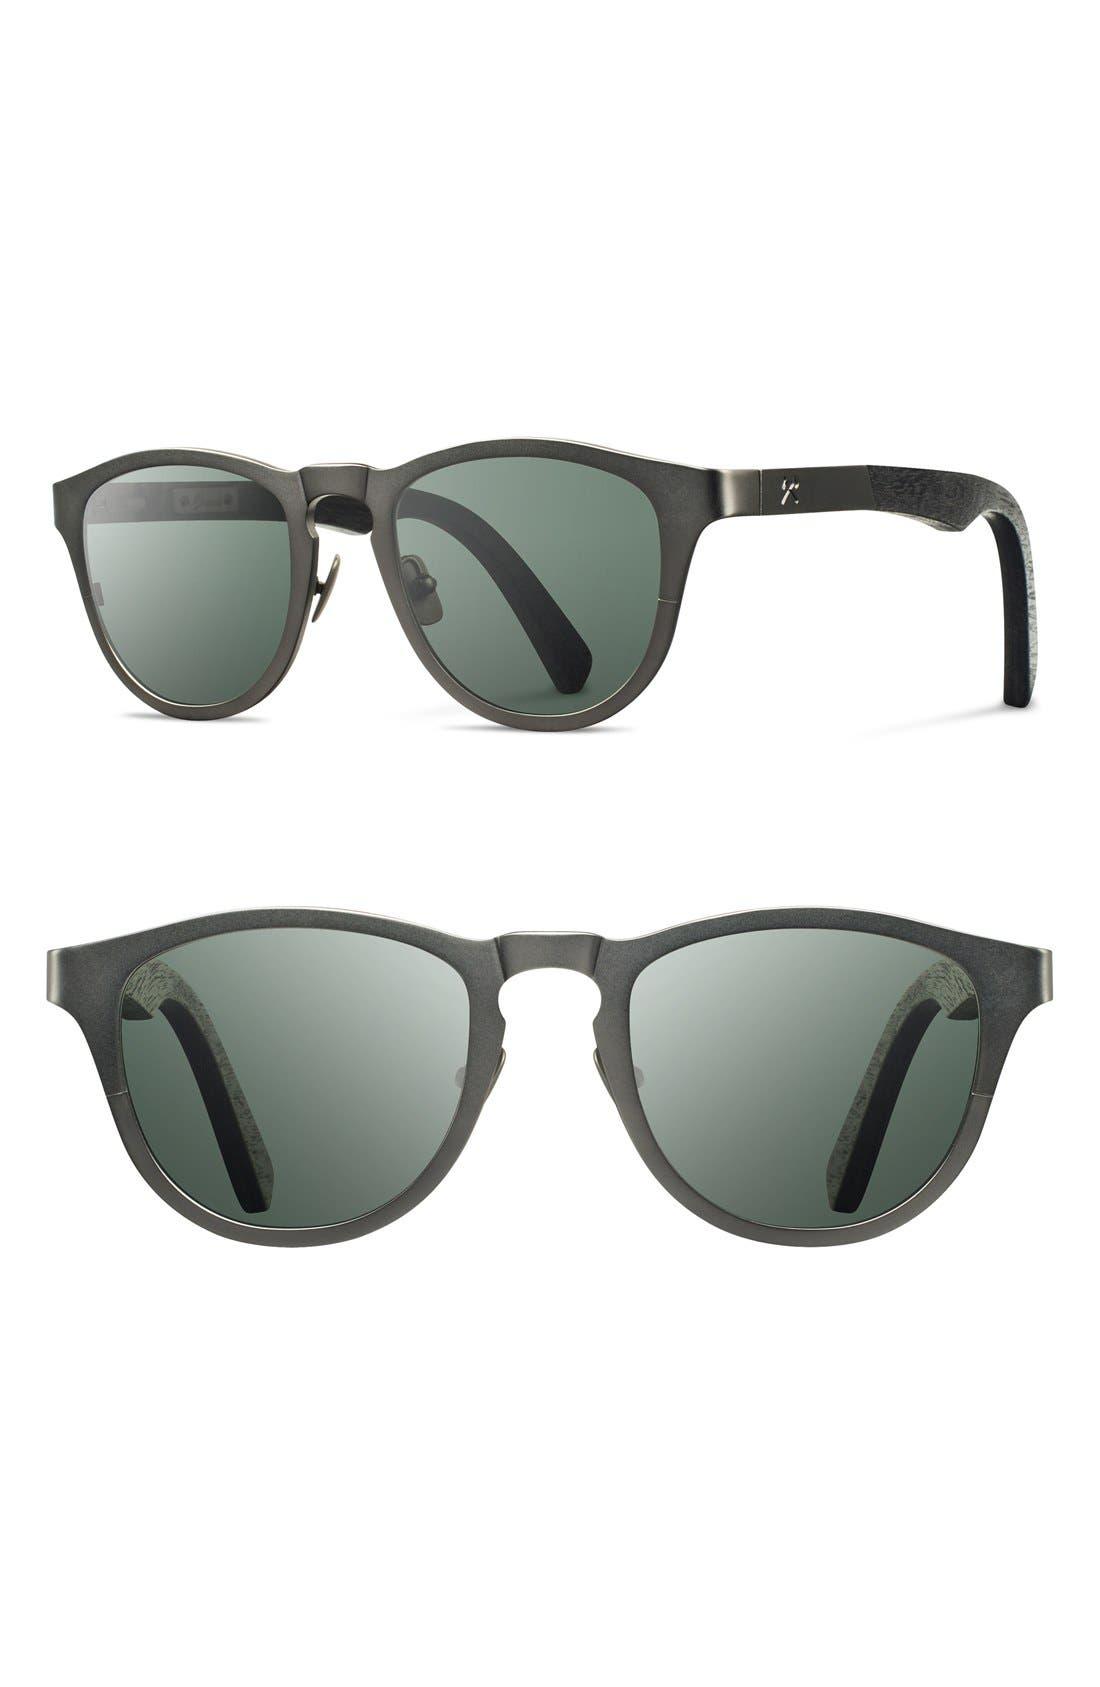 'Francis' 49mm Polarized Titanium & Wood Sunglasses,                             Main thumbnail 1, color,                             Gunmetal/ Dark Walnut